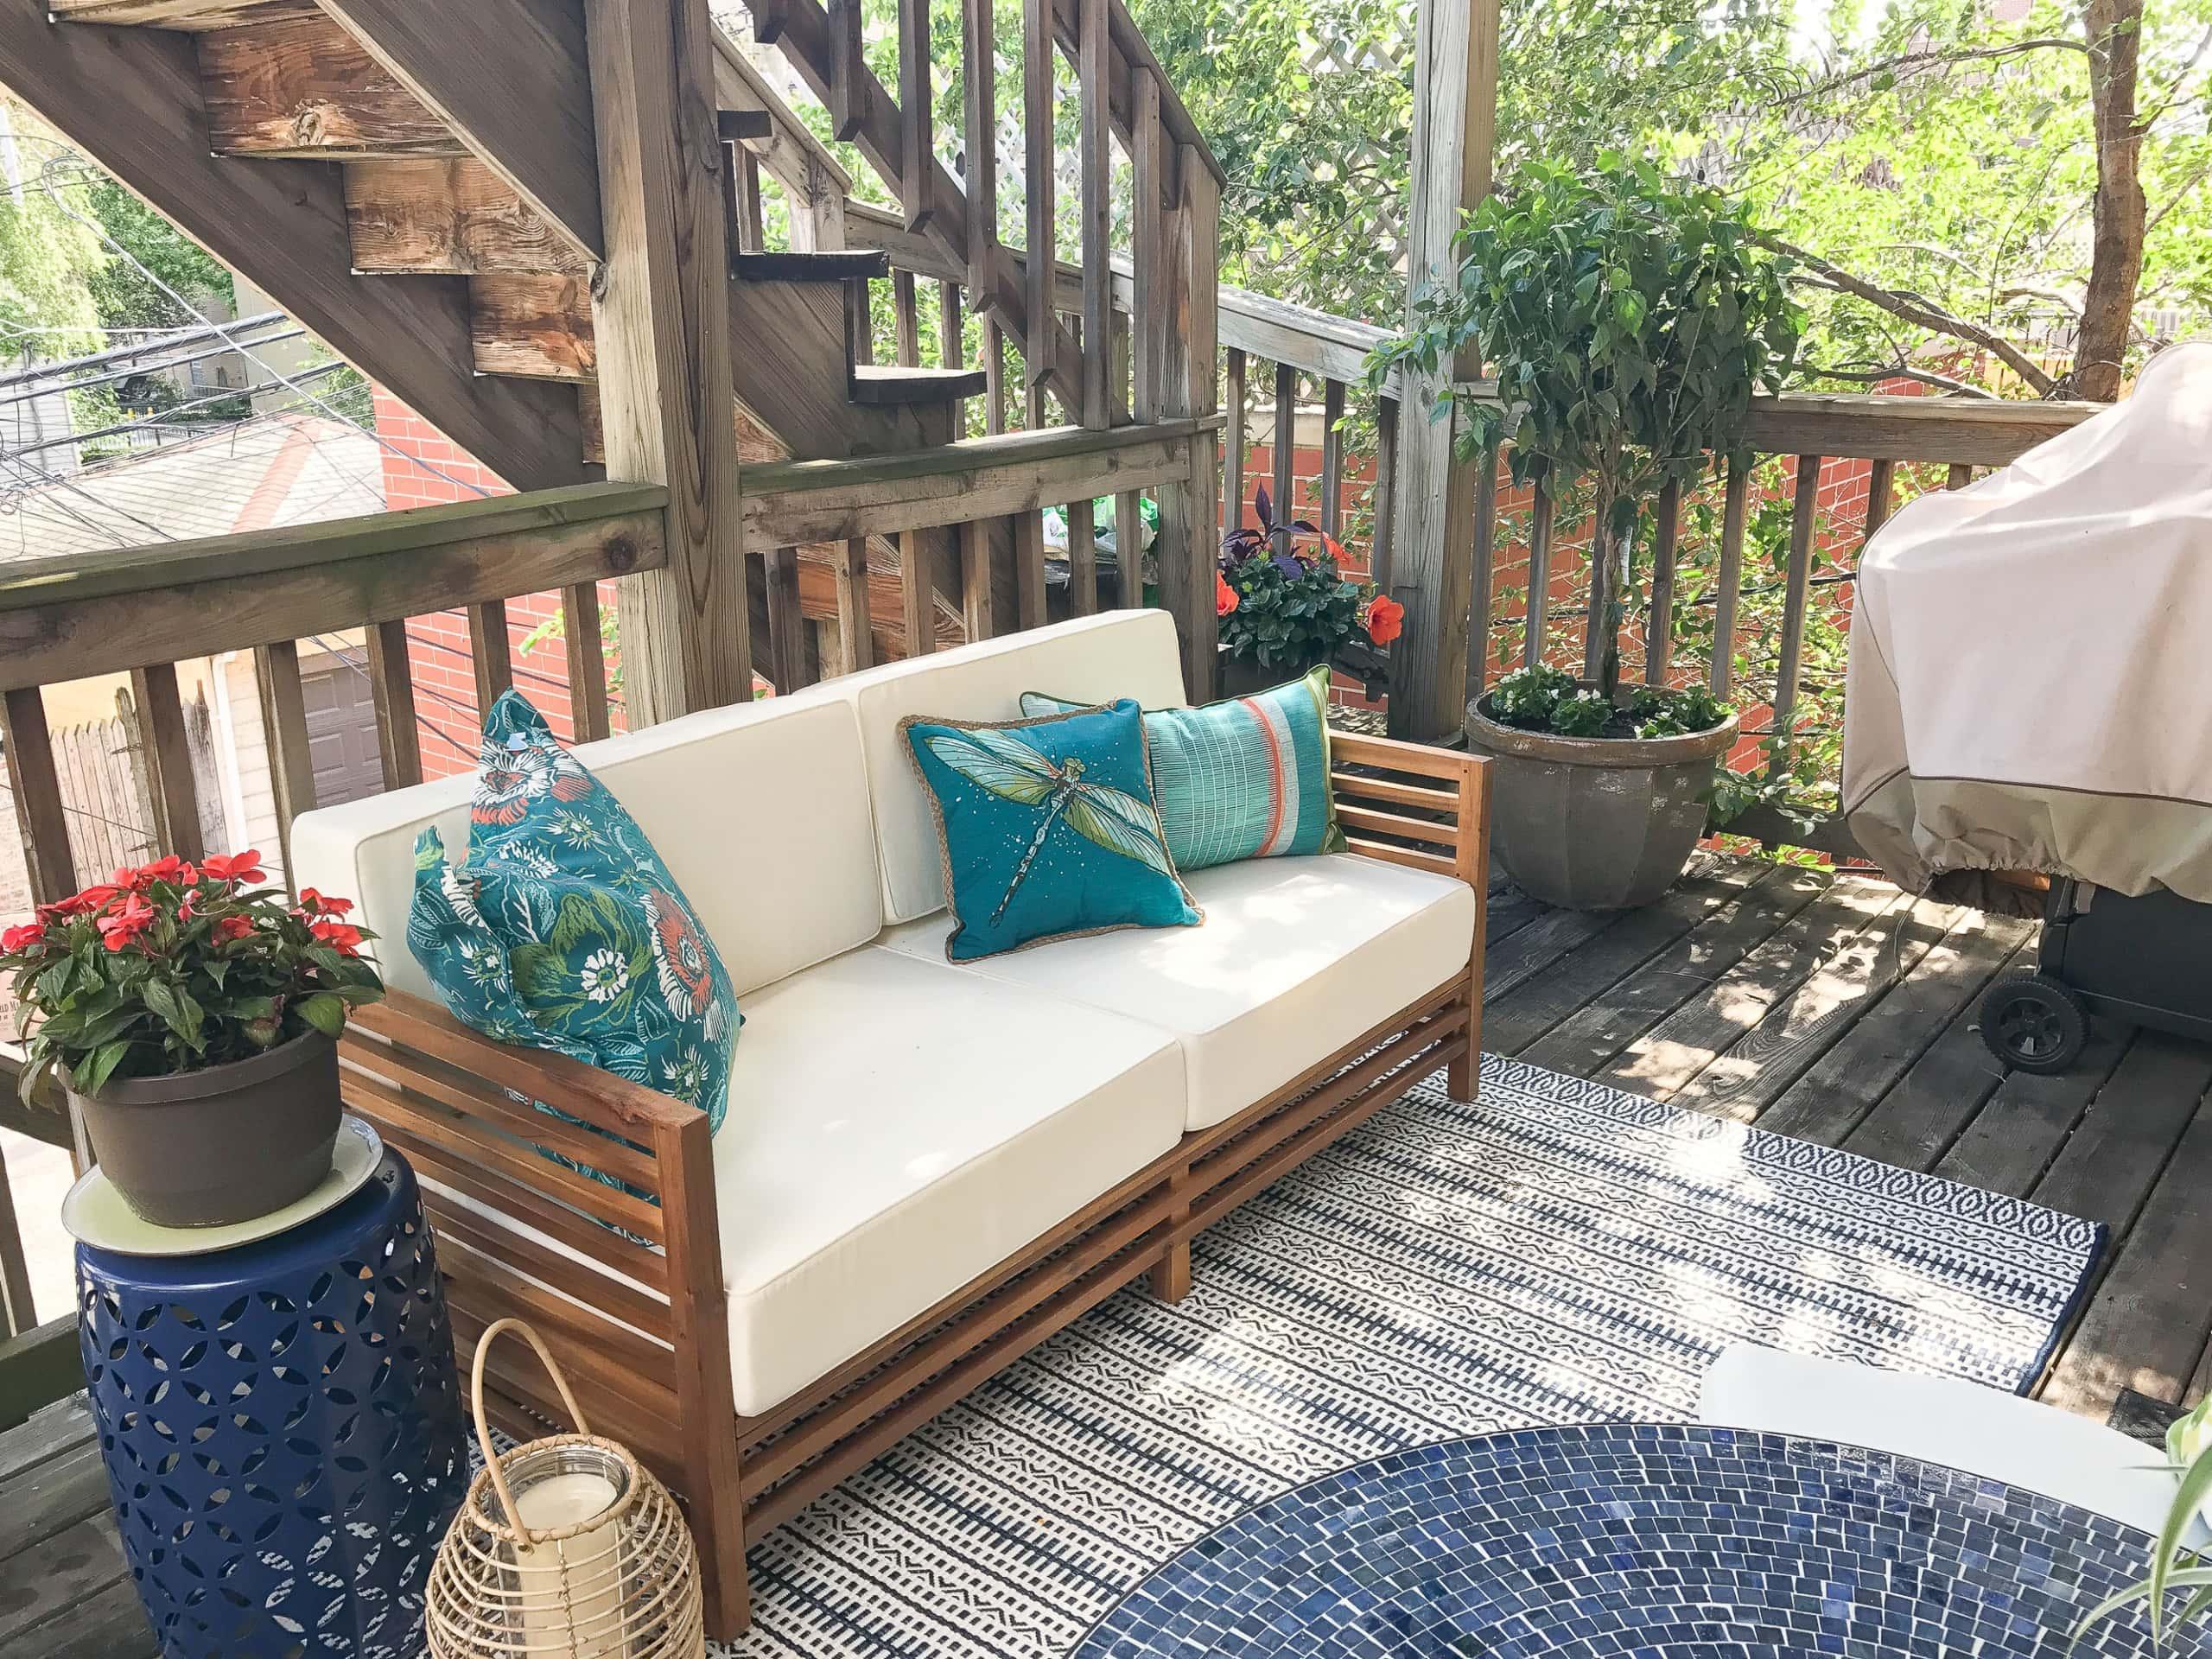 Ryan's balcony